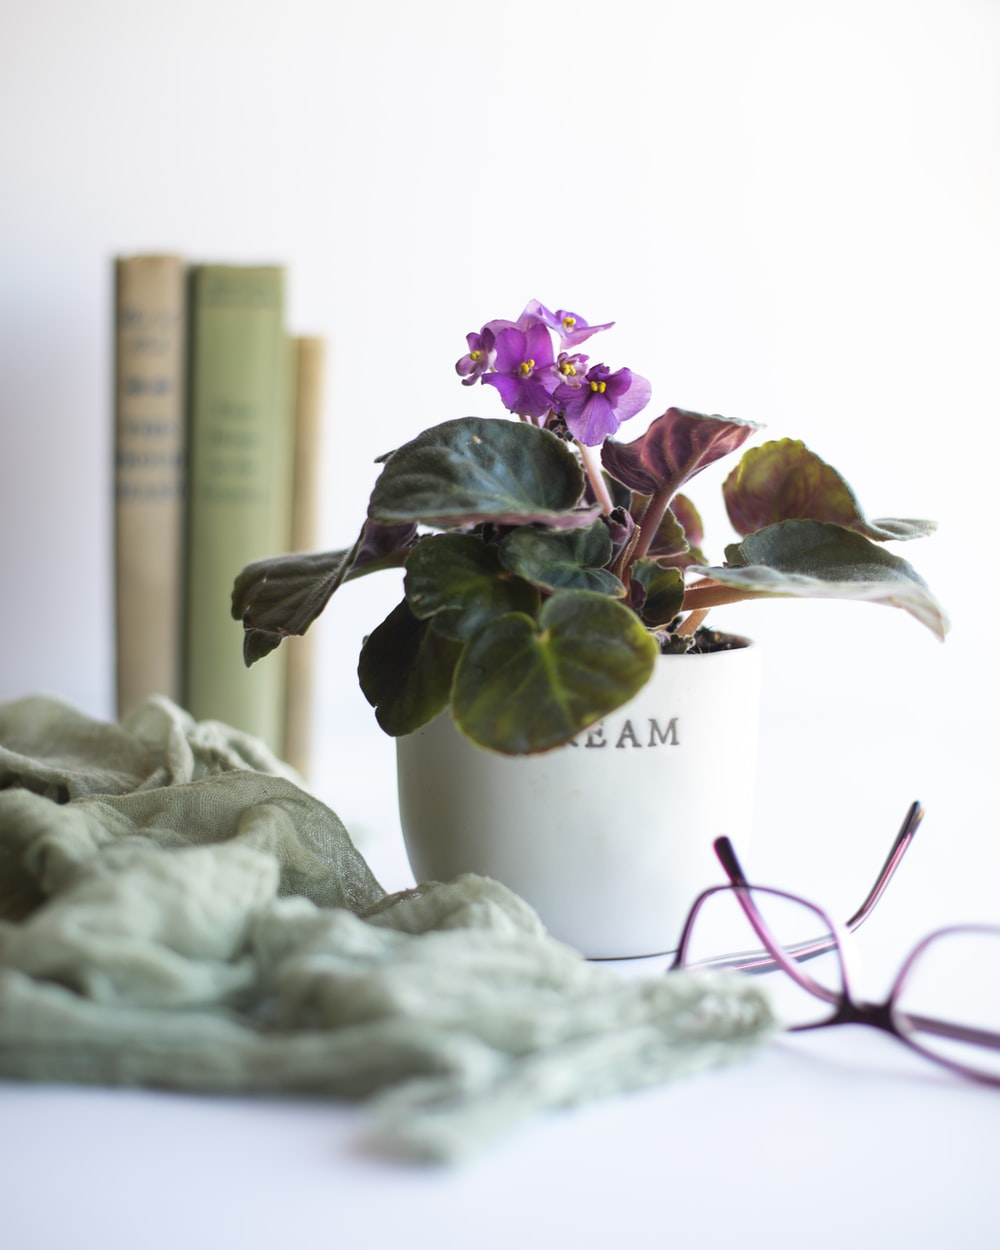 purple and white flowers in white ceramic vase